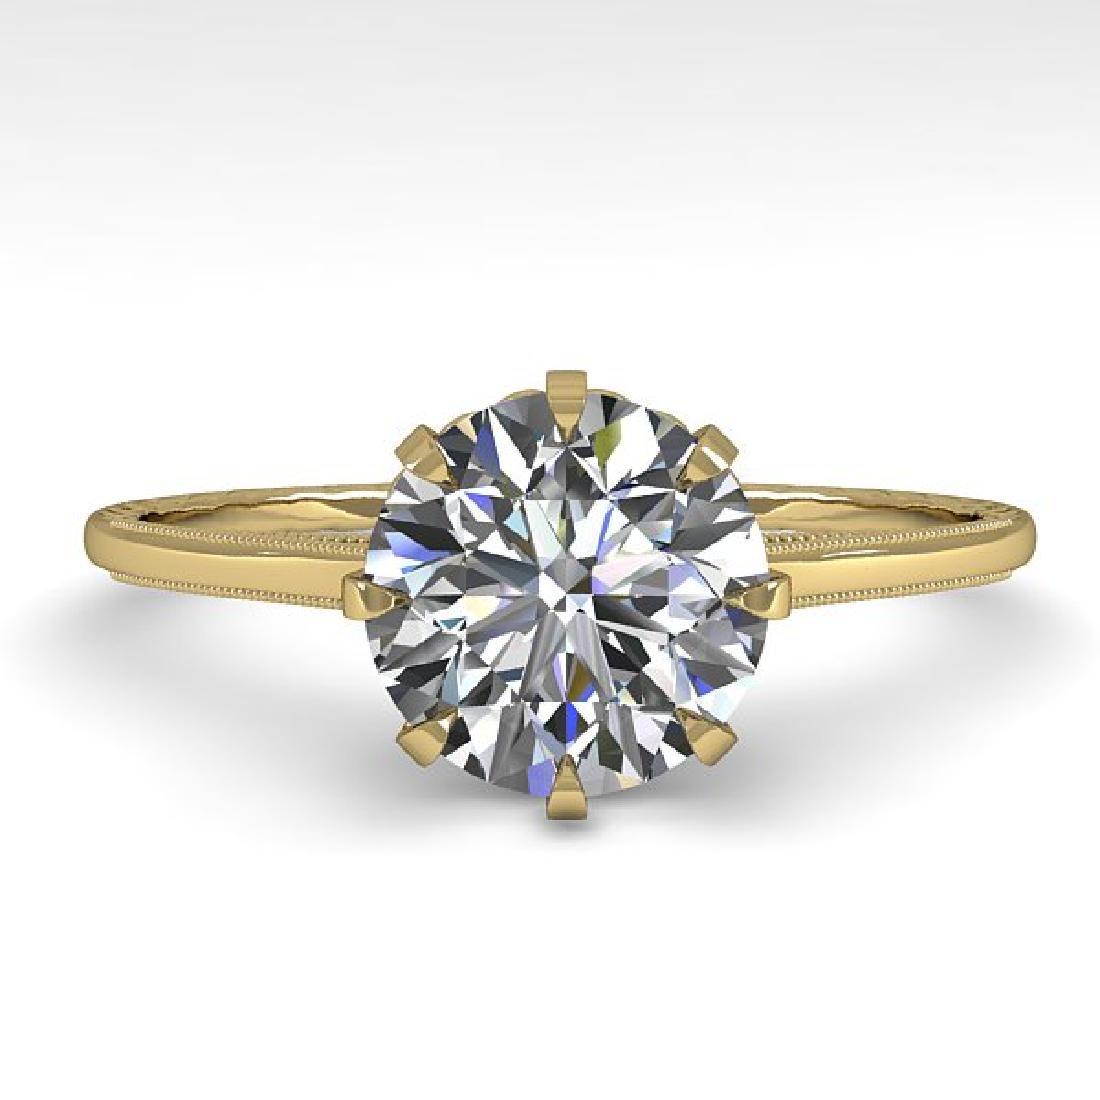 1.51 CTW Certified VS/SI Diamond Ring 14K Yellow Gold